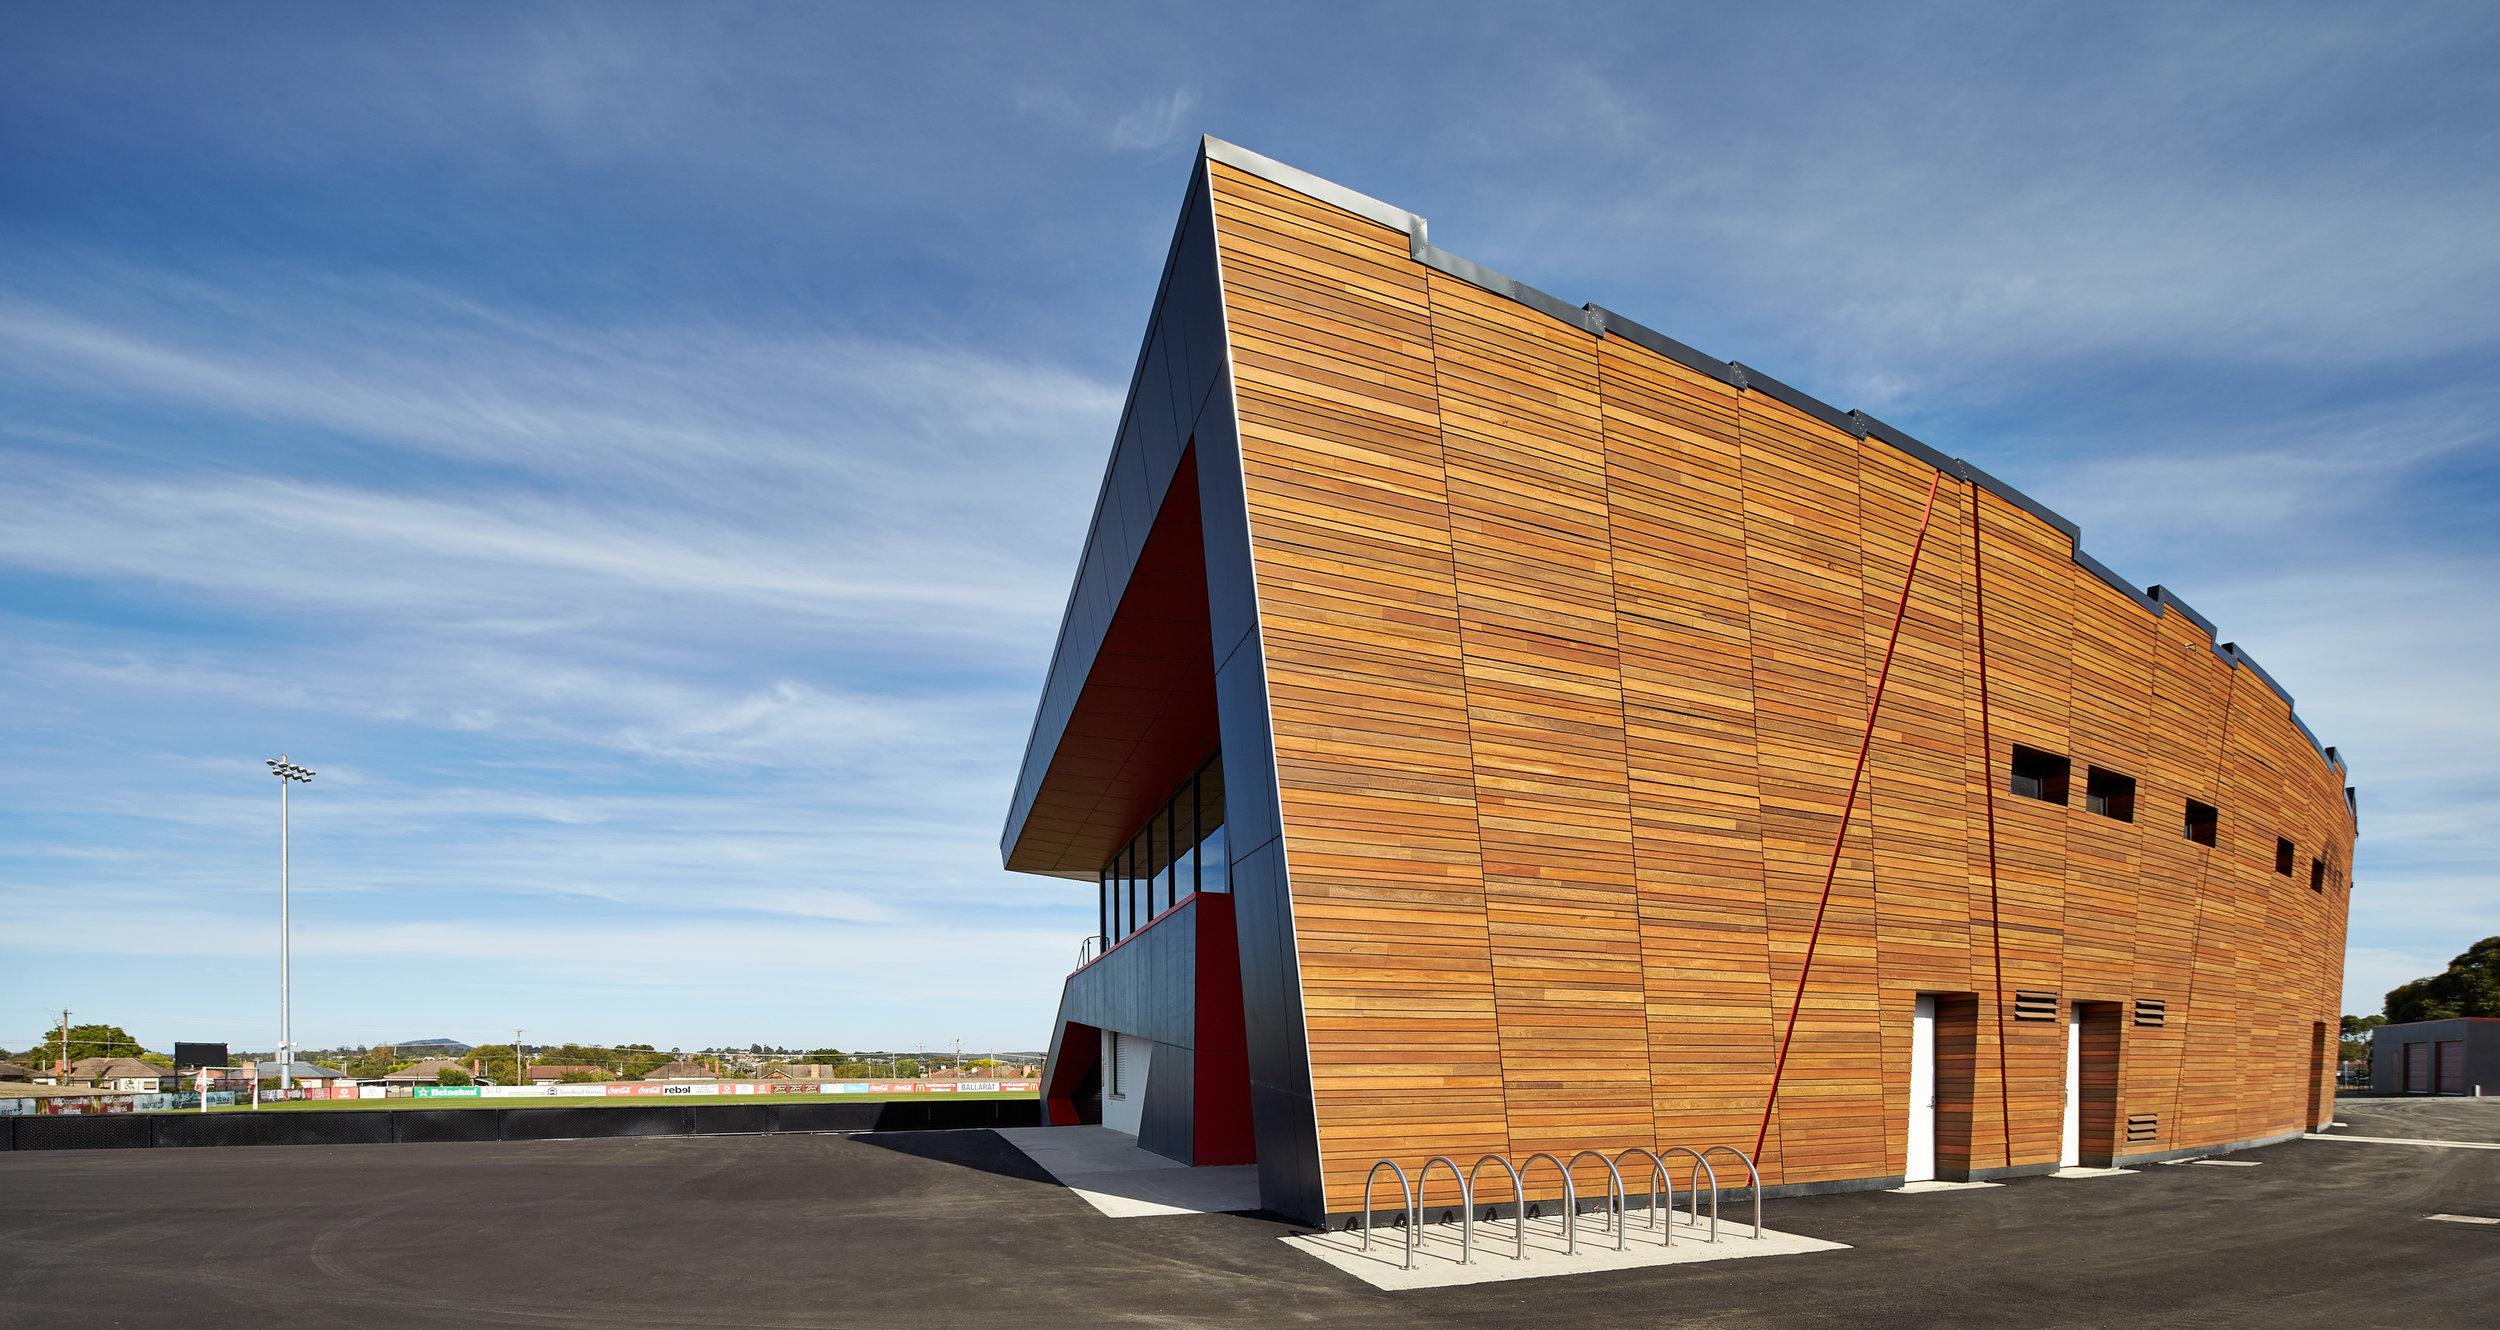 Ballarat Regional Soccer and Community Facility